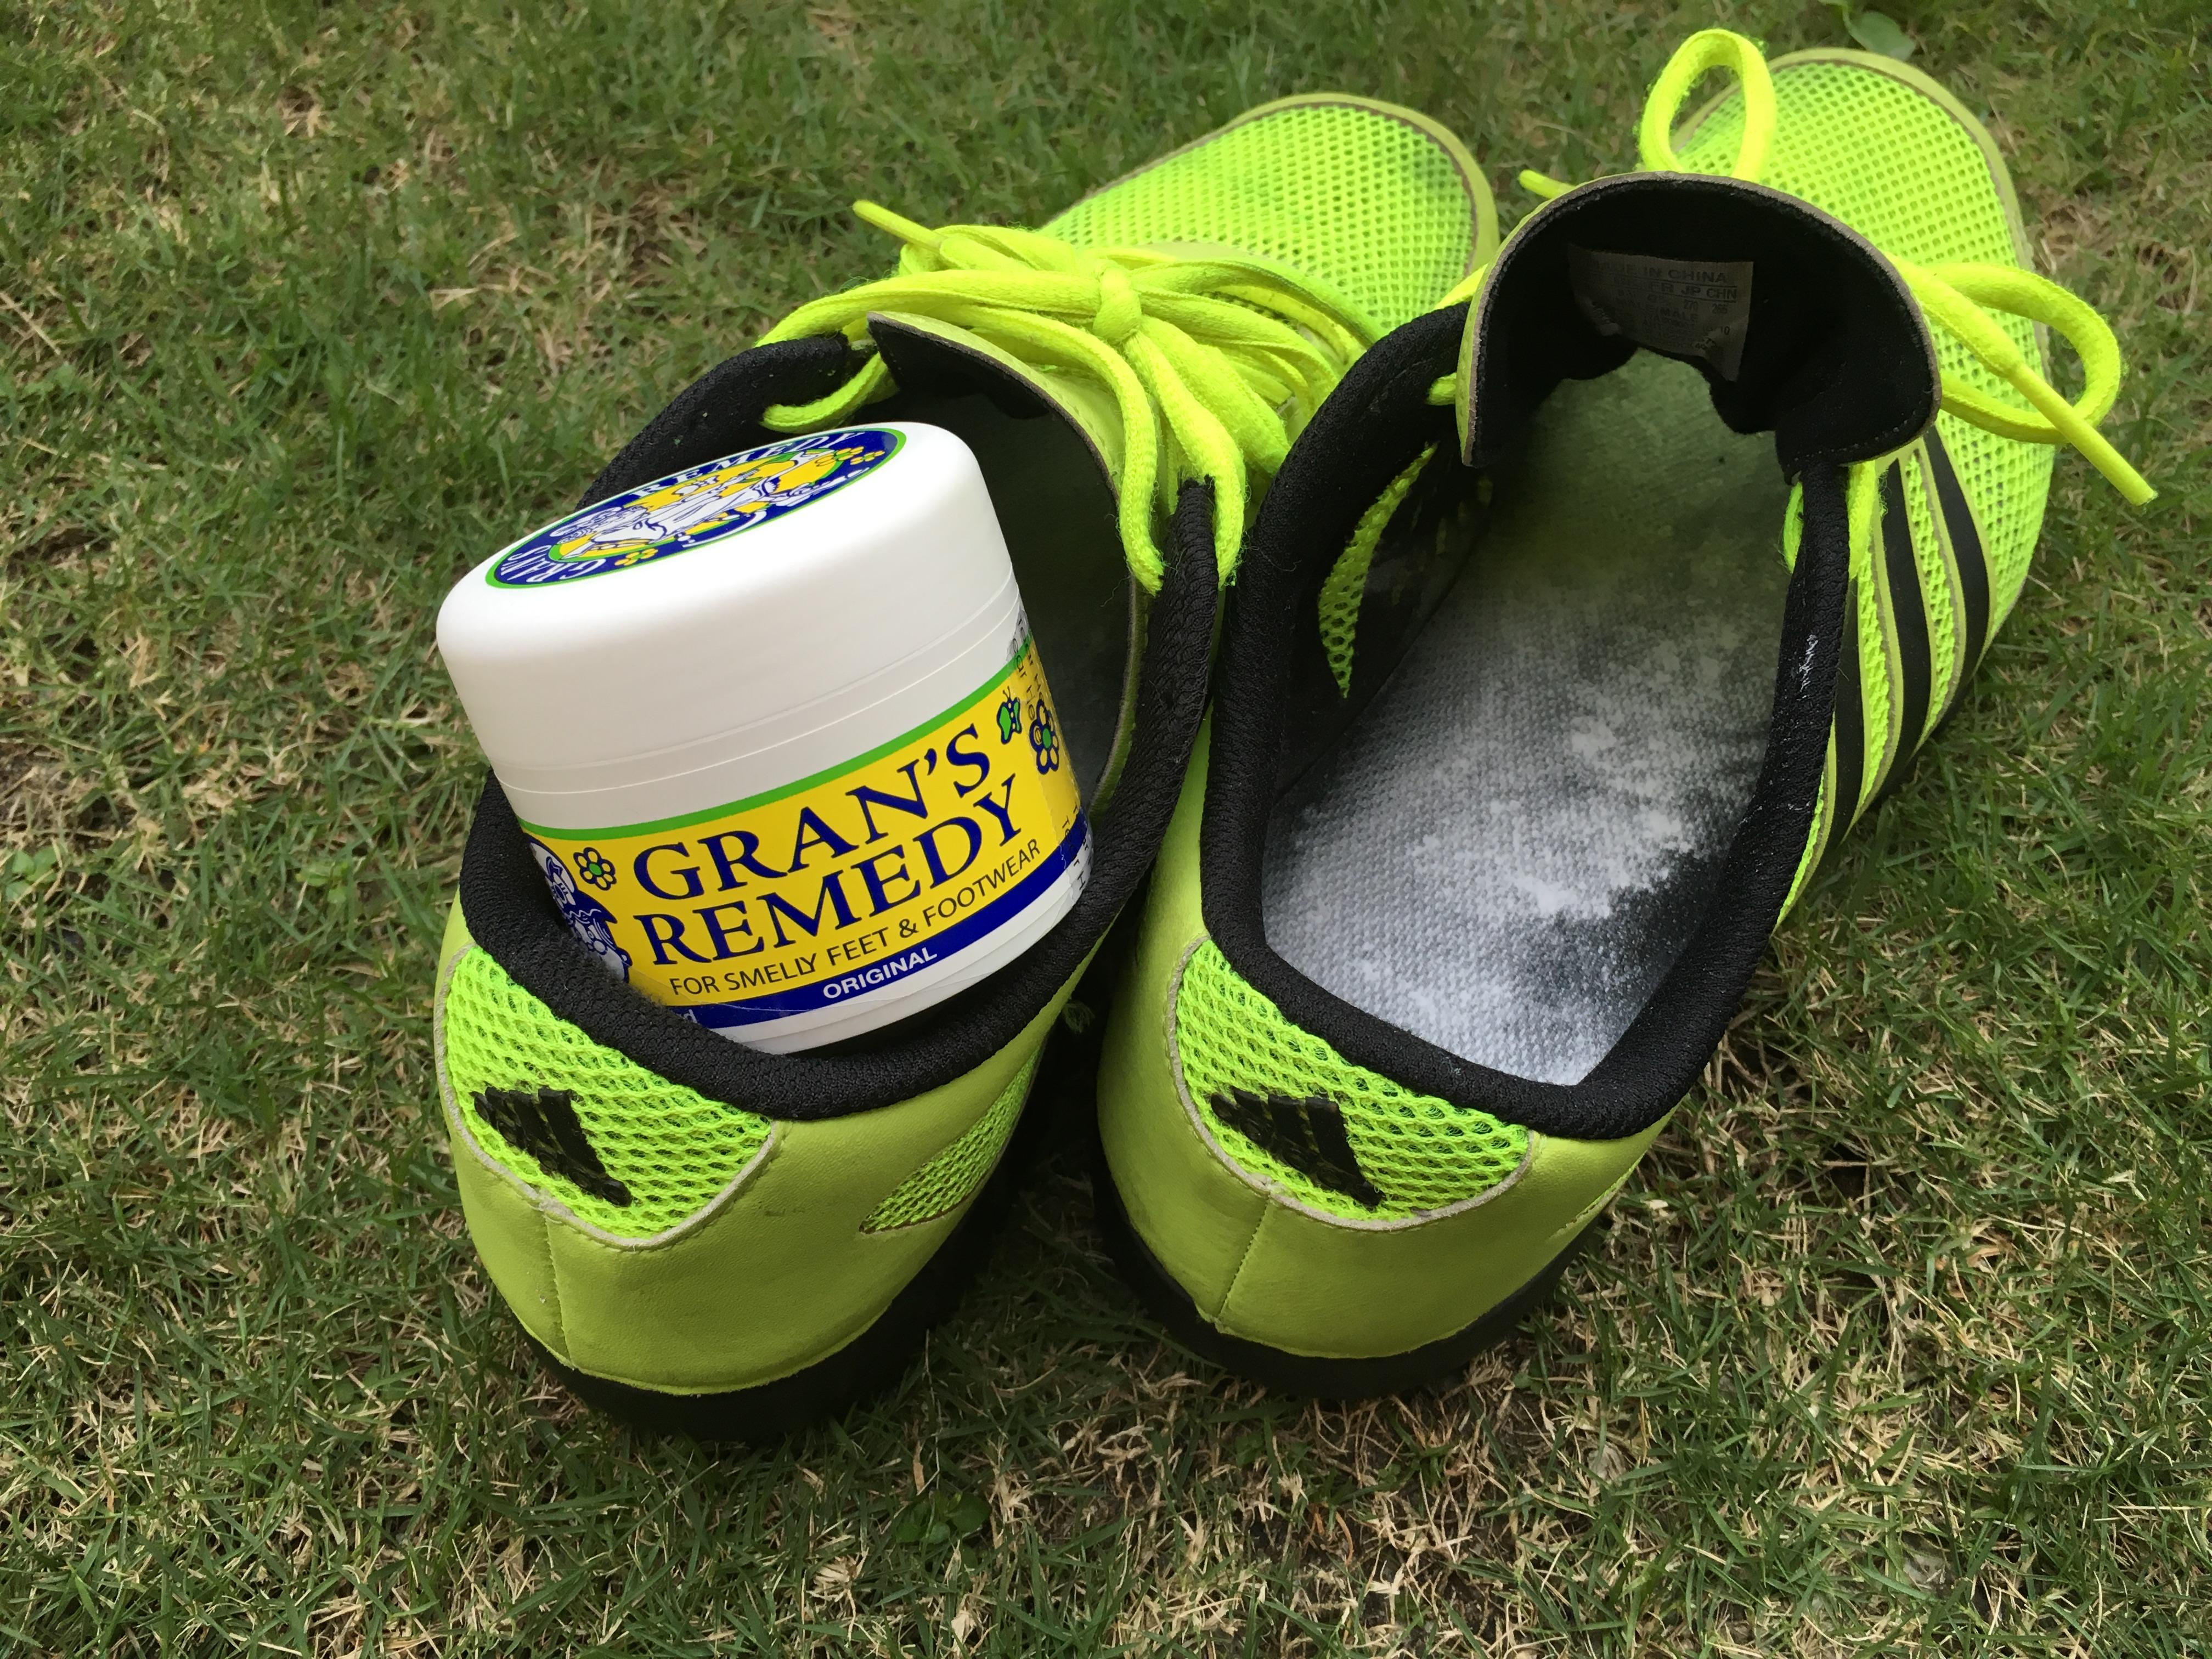 Grans Remedy 05